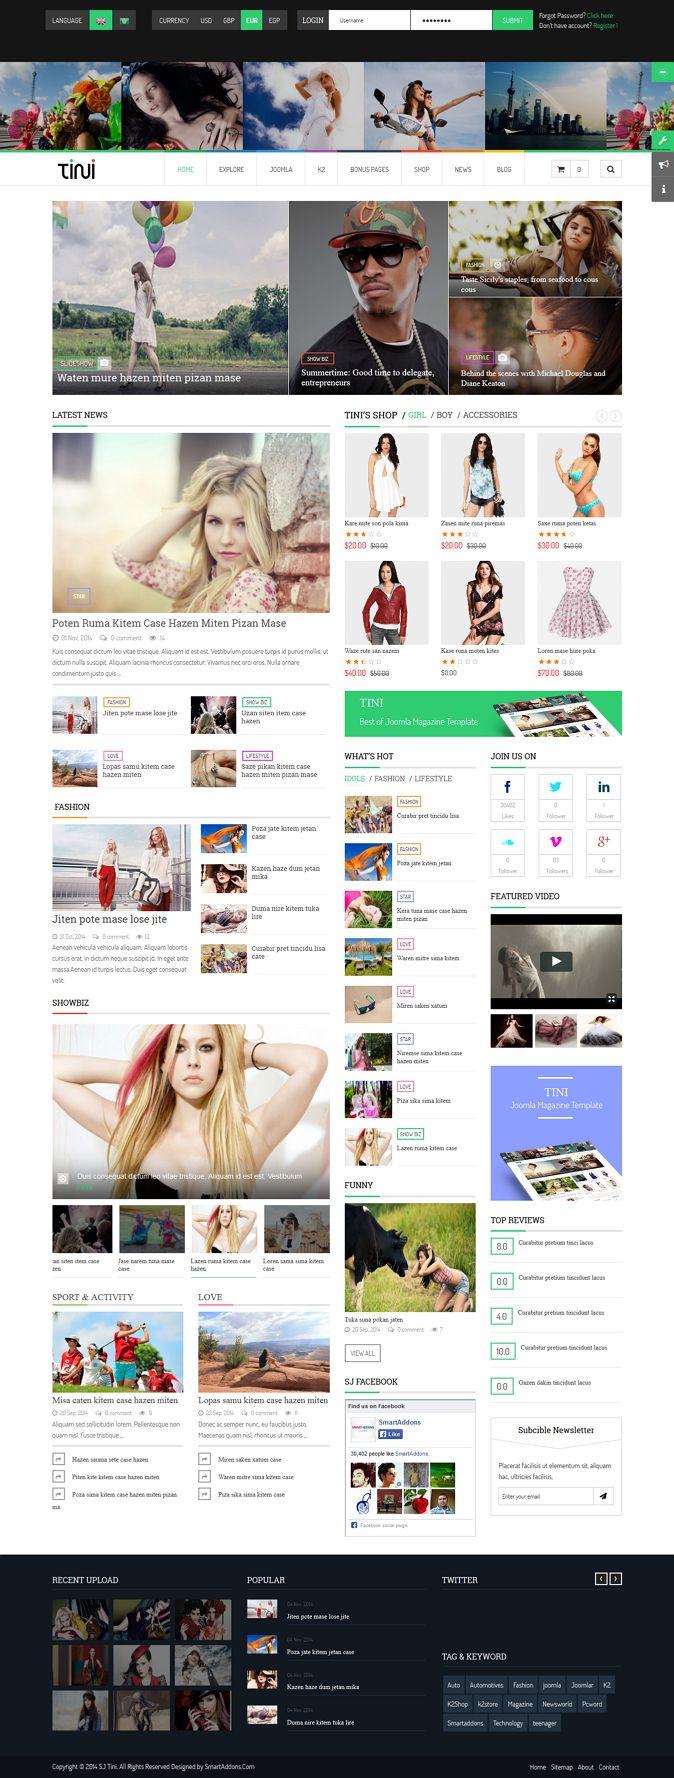 Tini New Joomla Template for News Magazine Shop